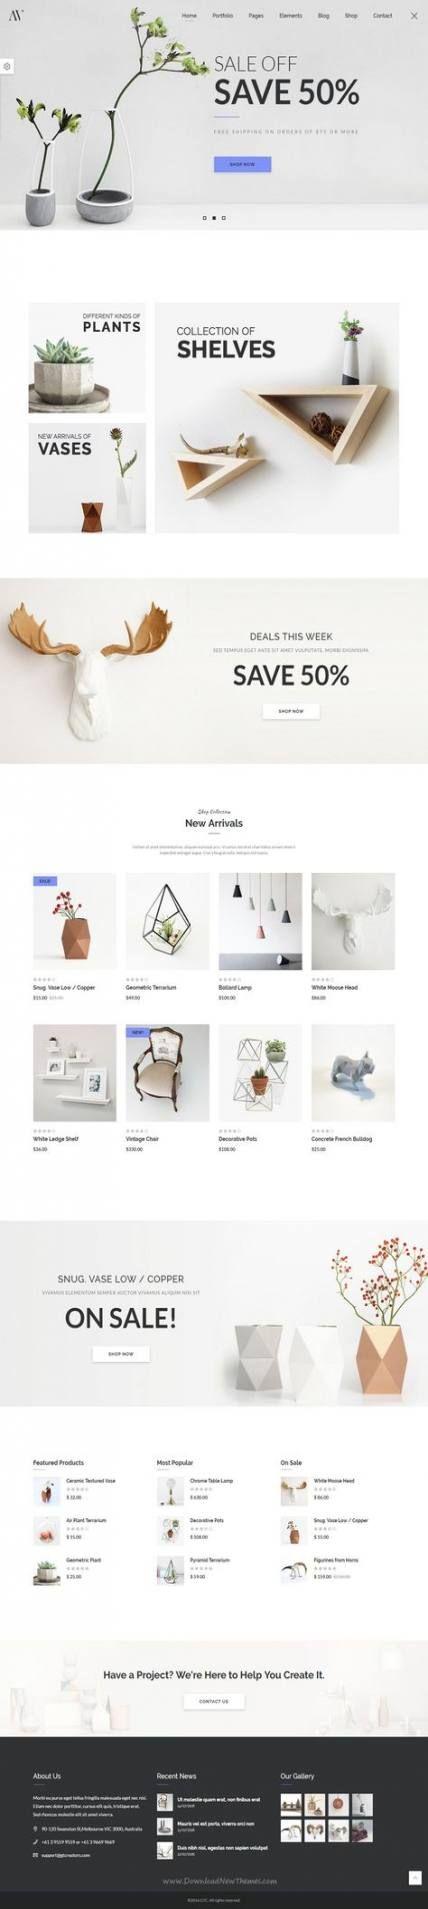 Trendy fashion design portfolio website business cards Ideas